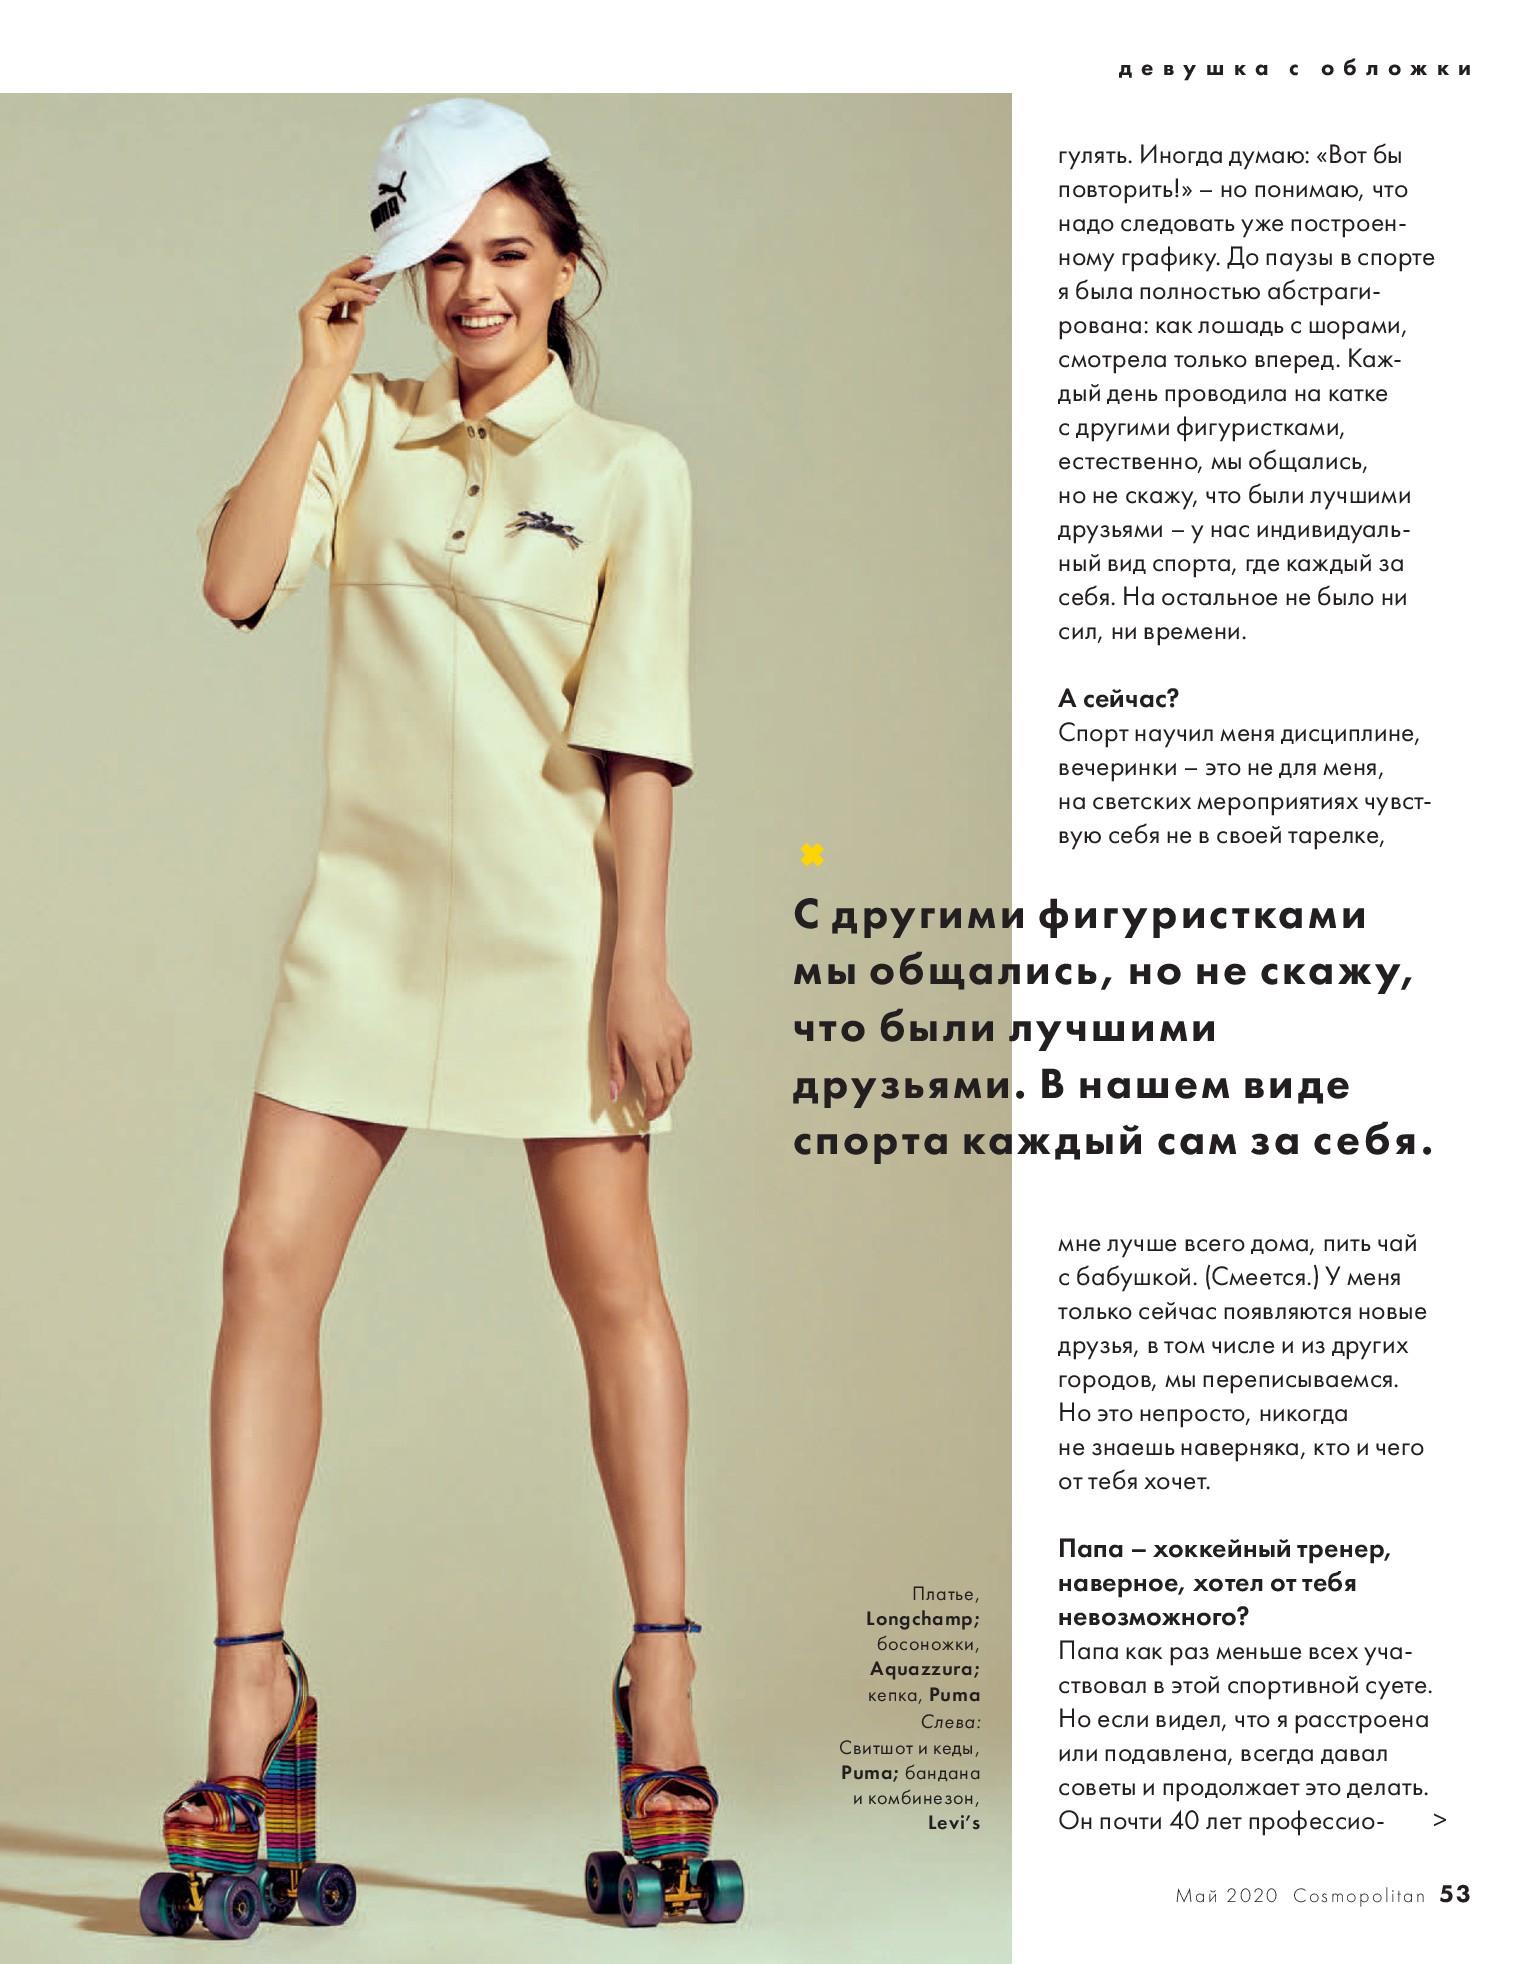 Алина Ильназовна Загитова-3 | Олимпийская чемпионка - Страница 6 M3O0KvFUO9A